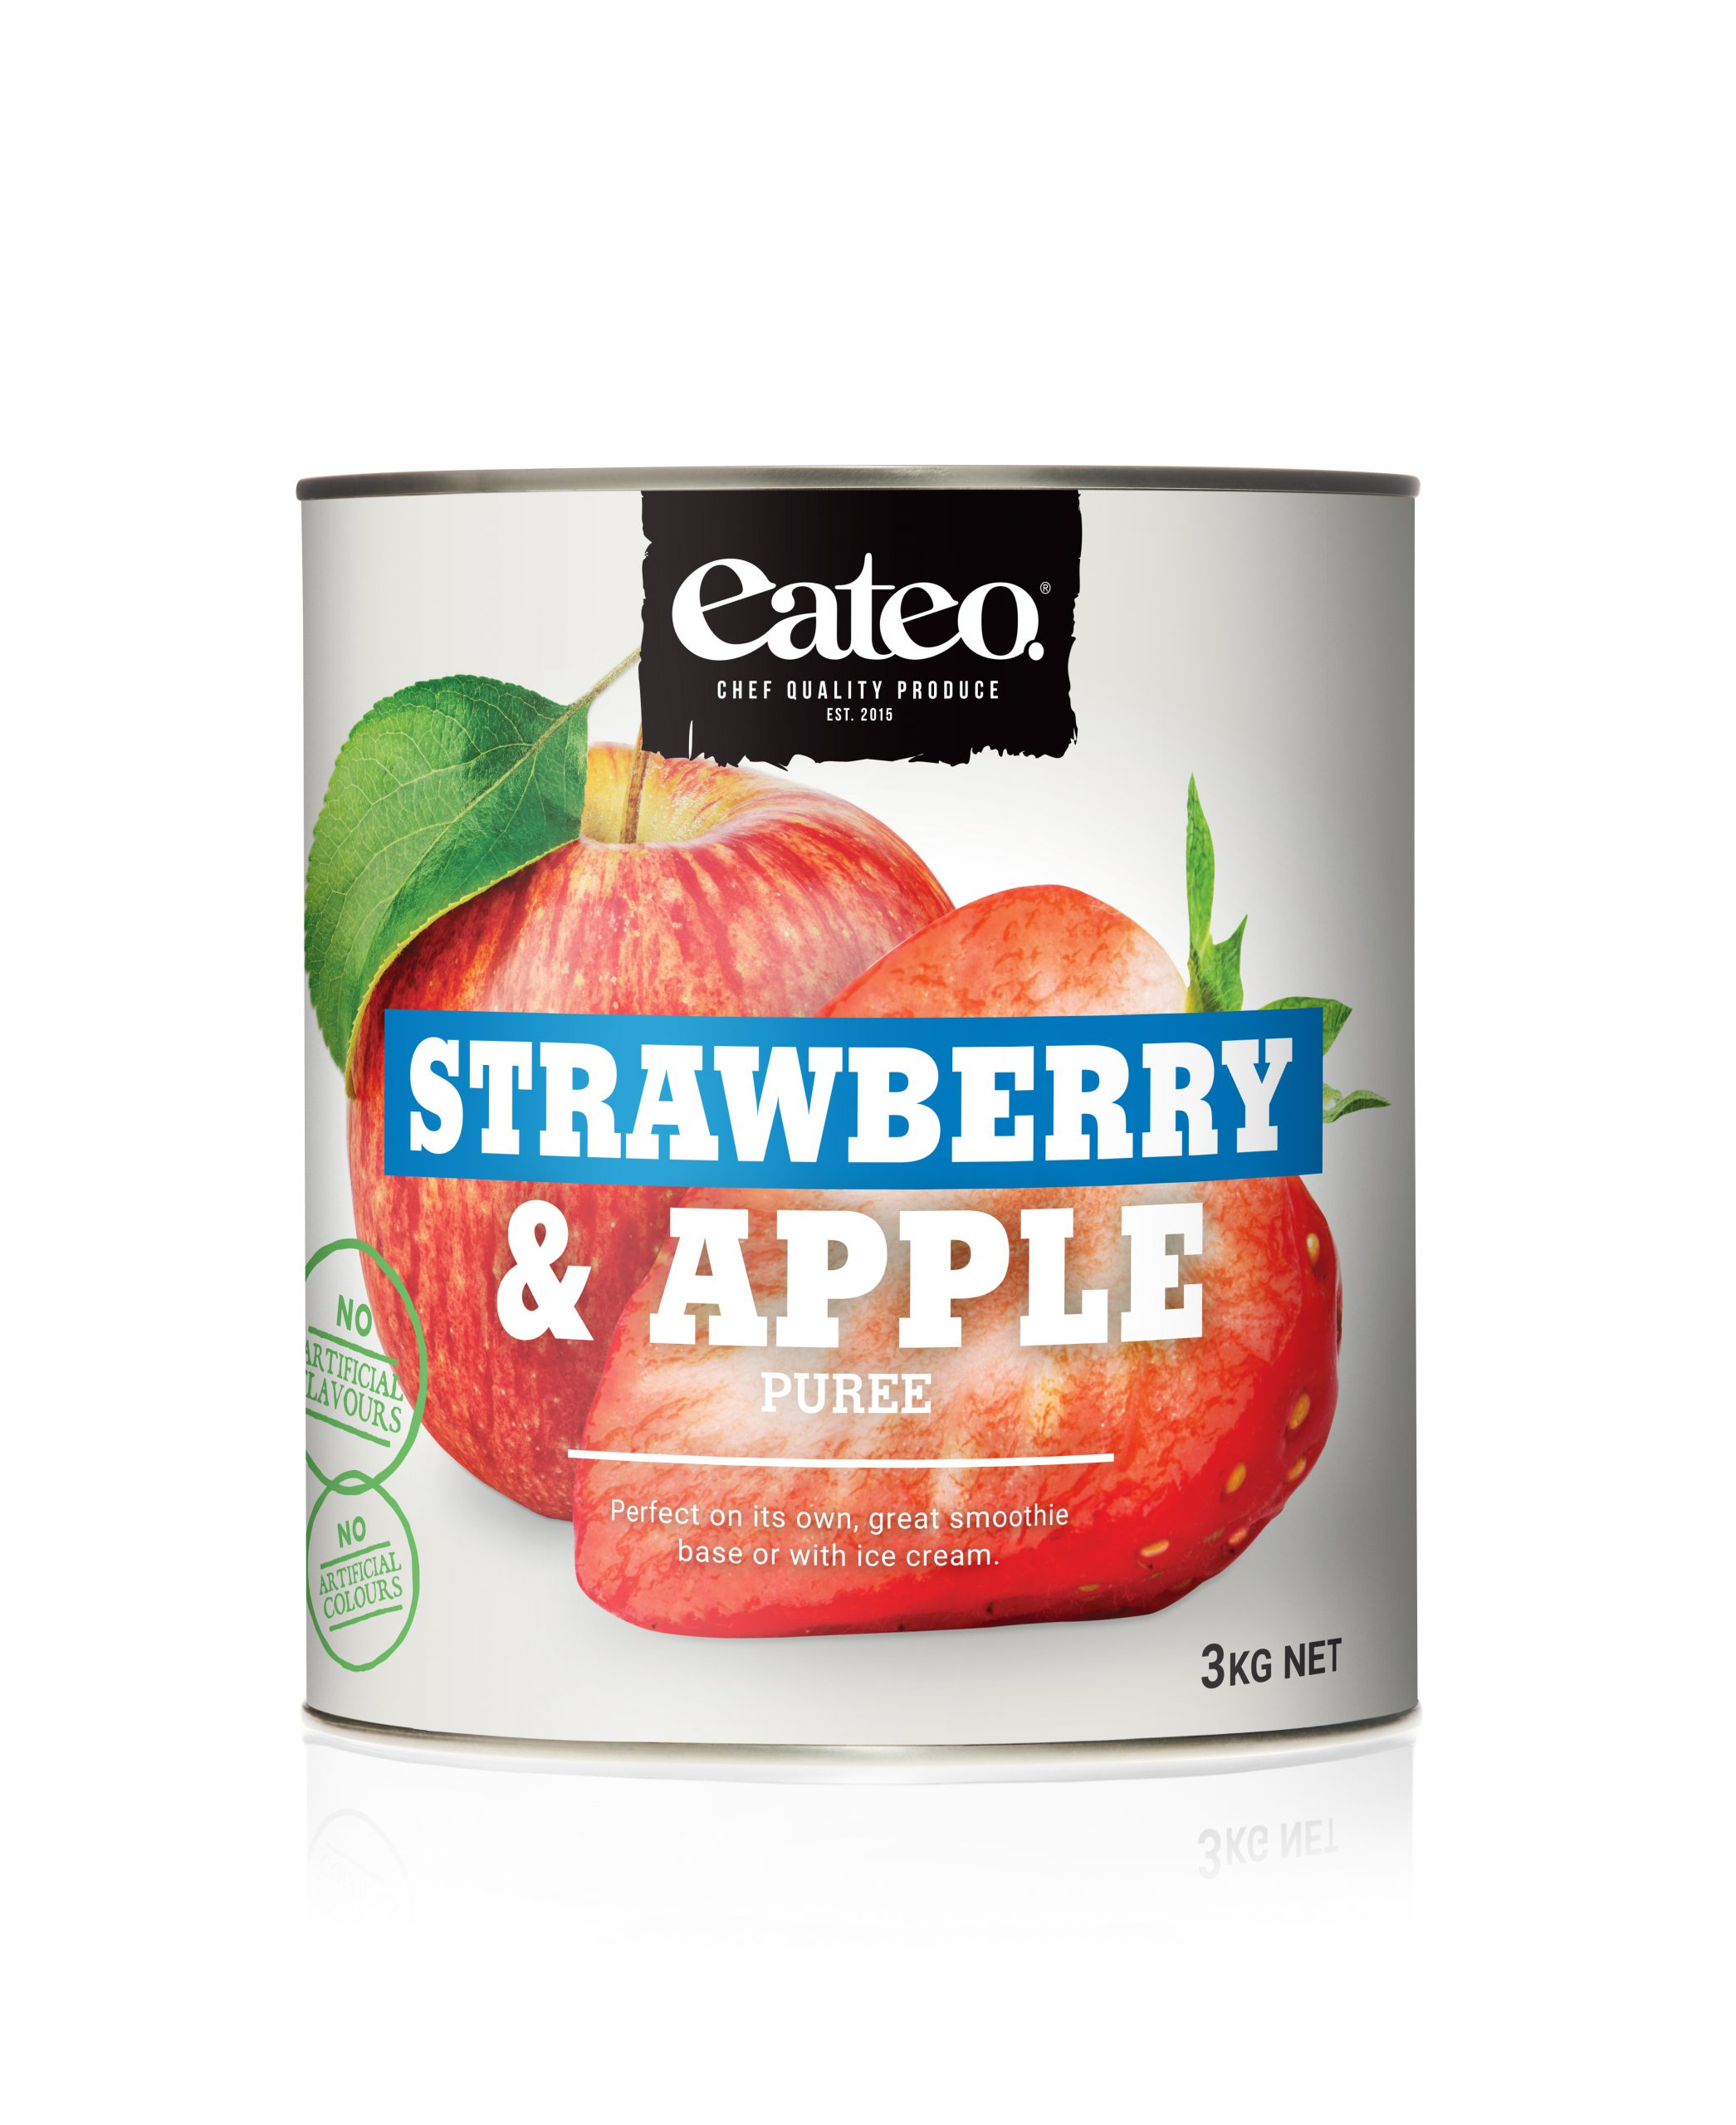 Strawberry & Apple Puree